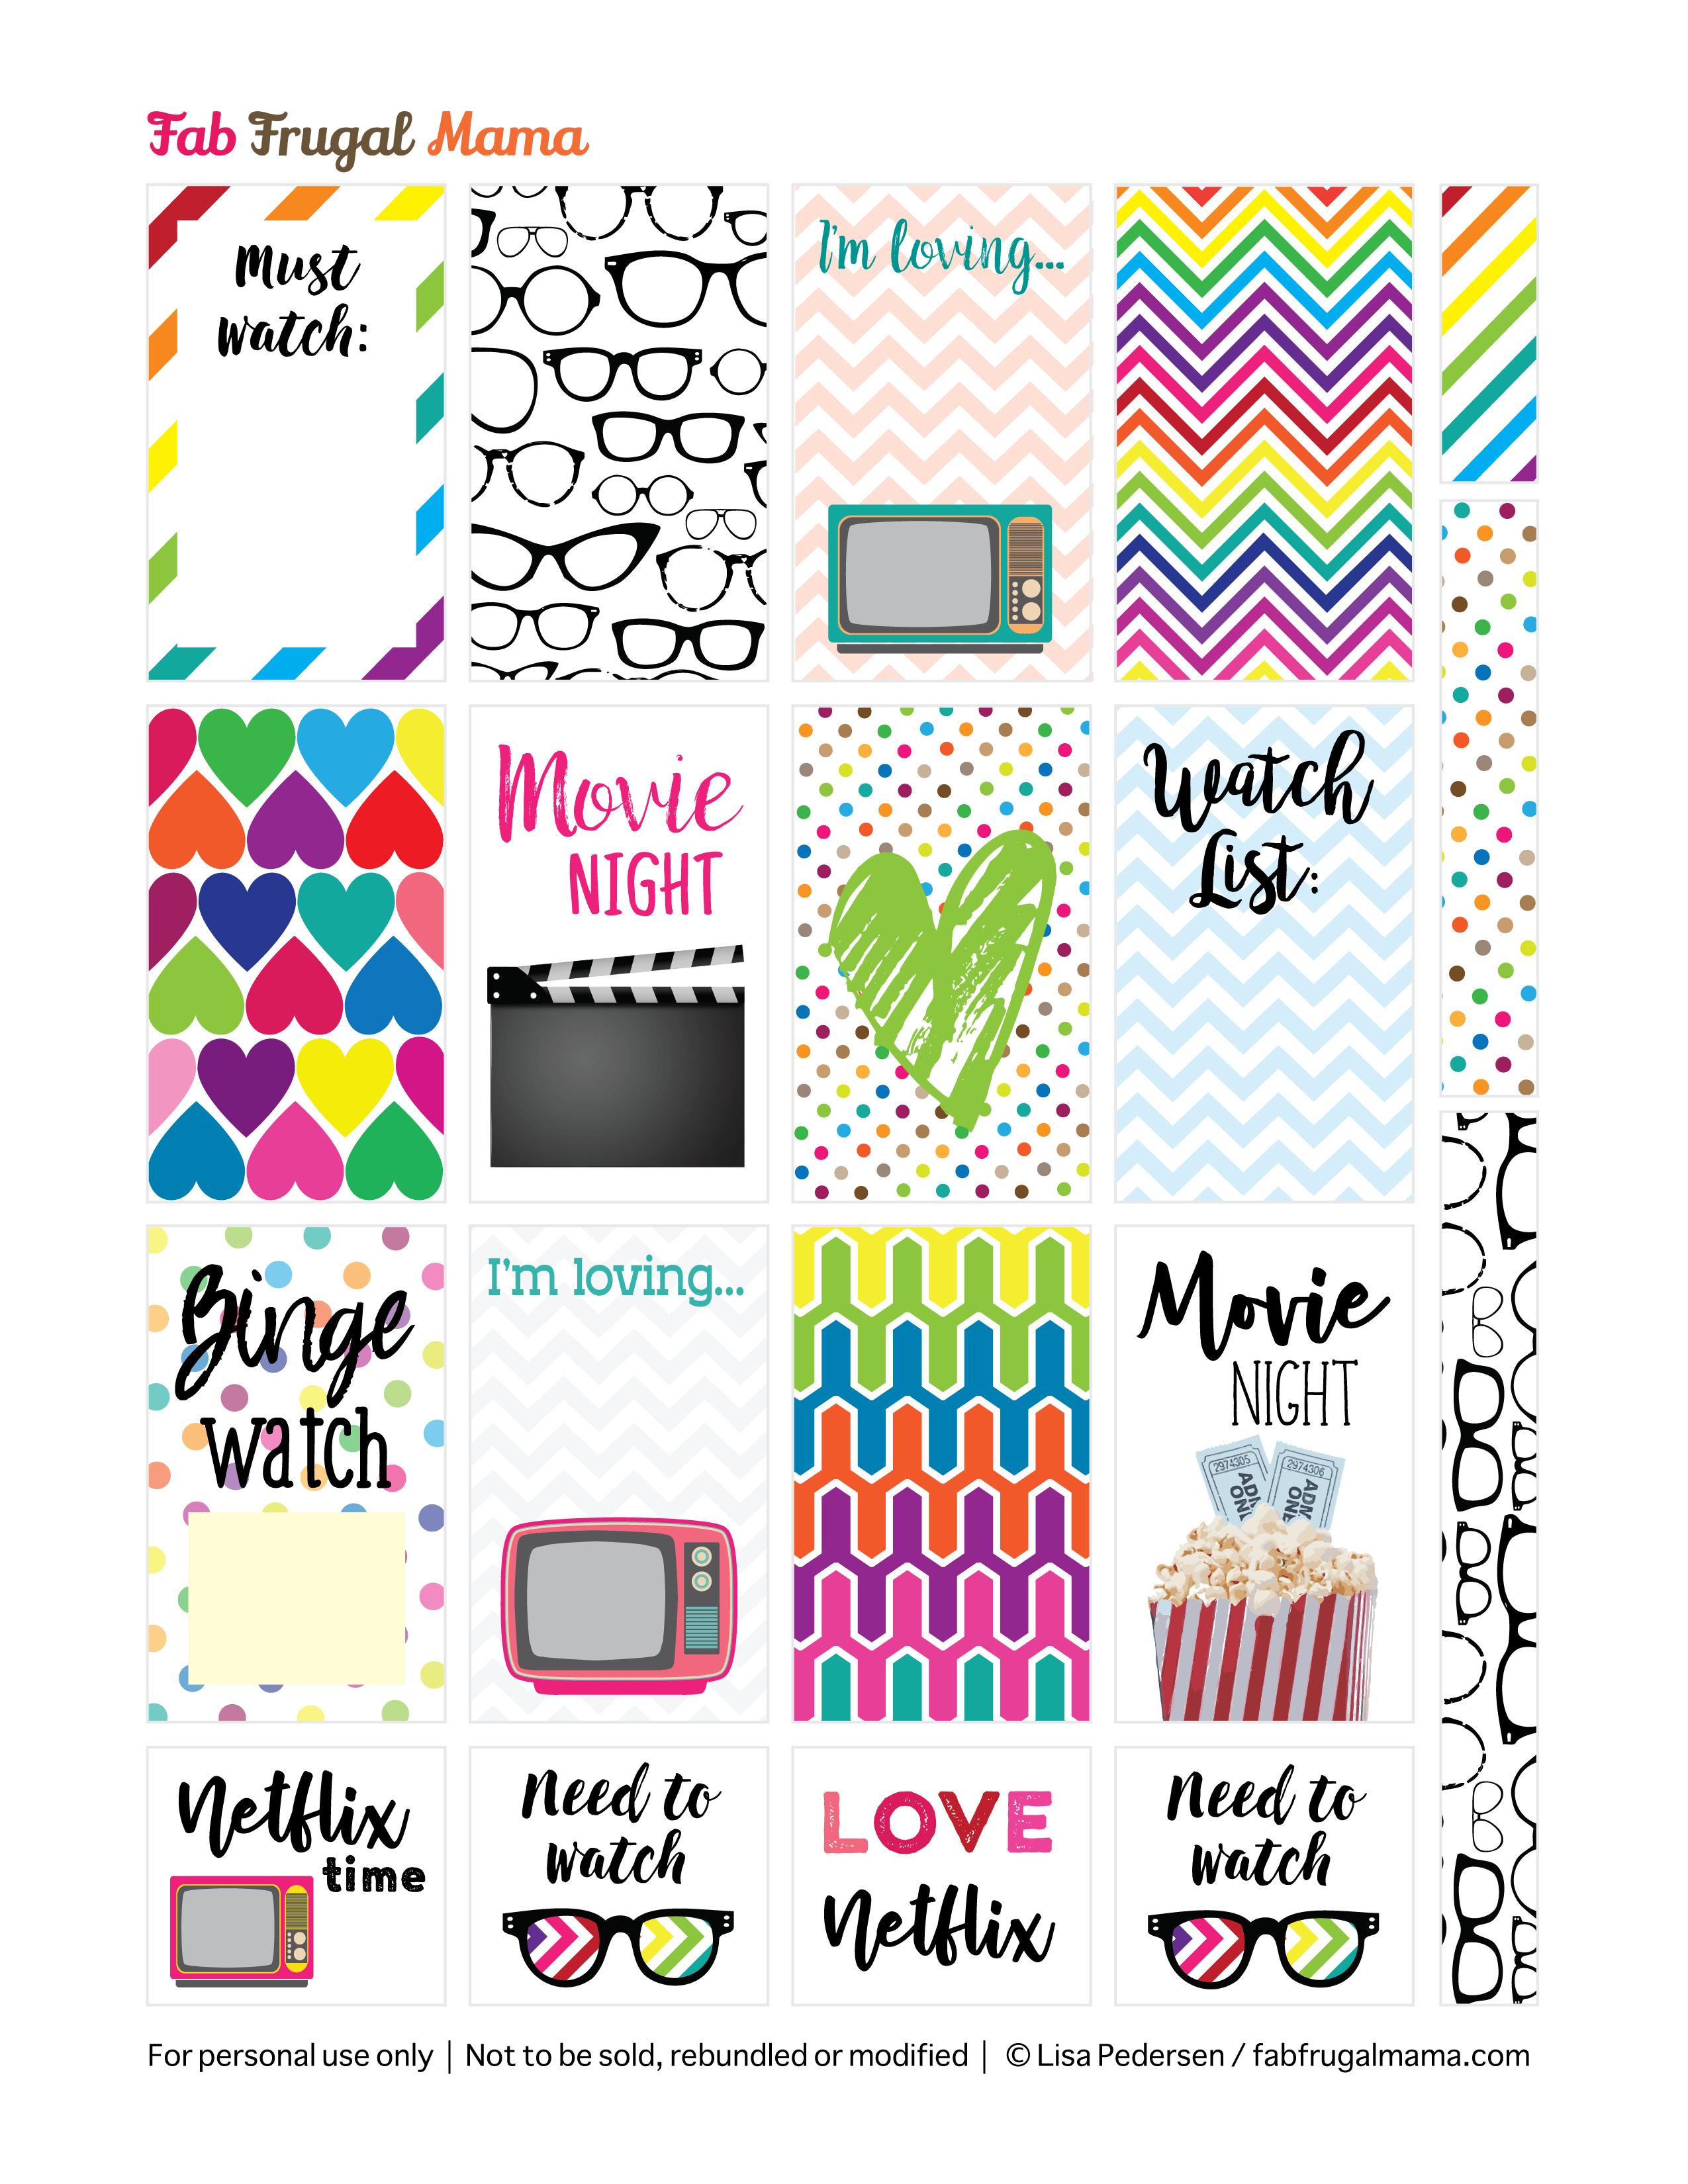 Free Printable Happy Planner Tv & Movie Stickers - Fab Frugal Mama - Free Printable Stickers